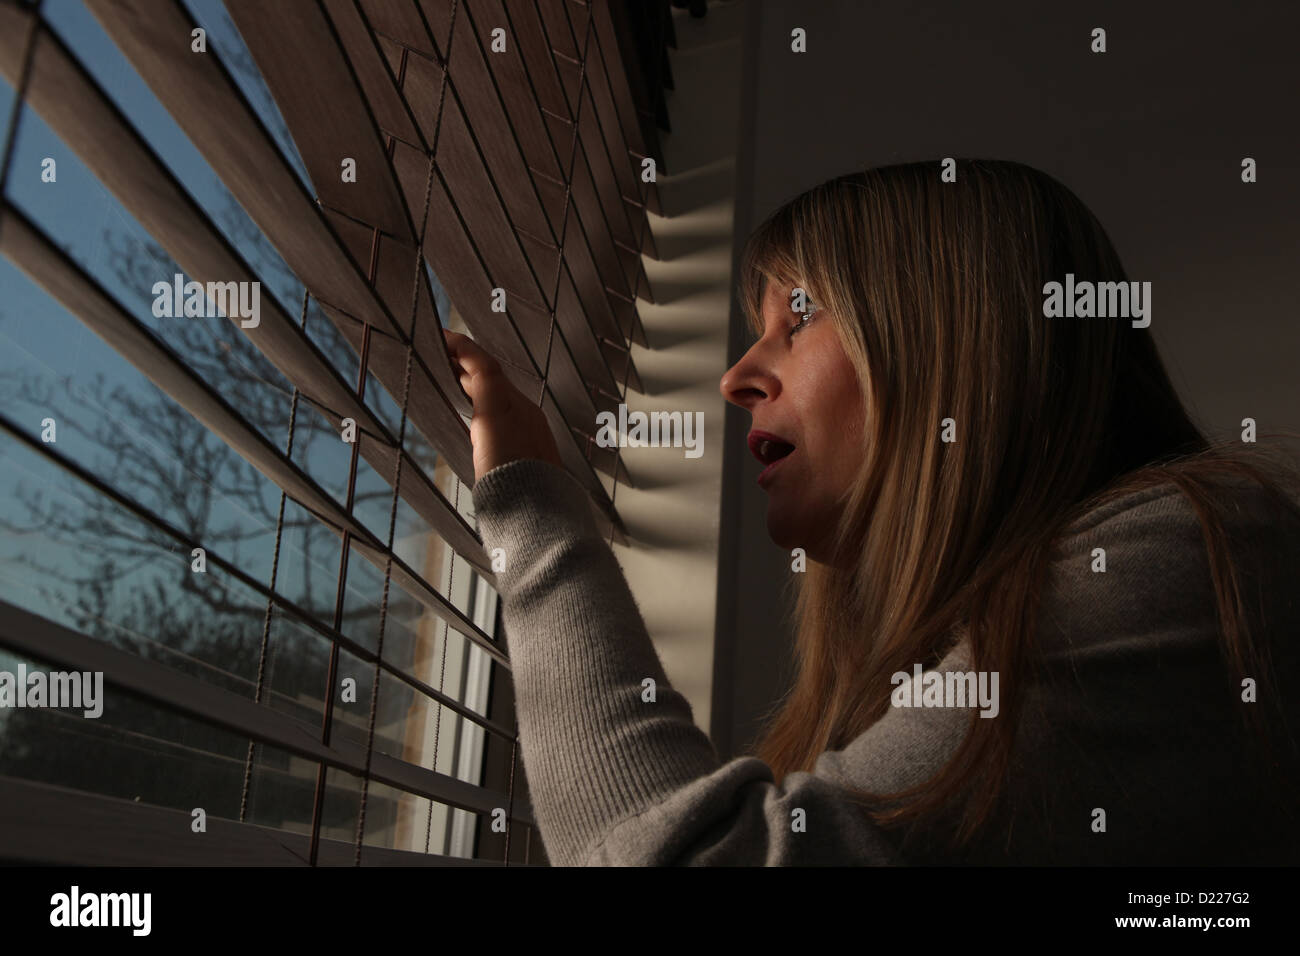 Anxious mature woman peering through window blinds at night. - Stock Image